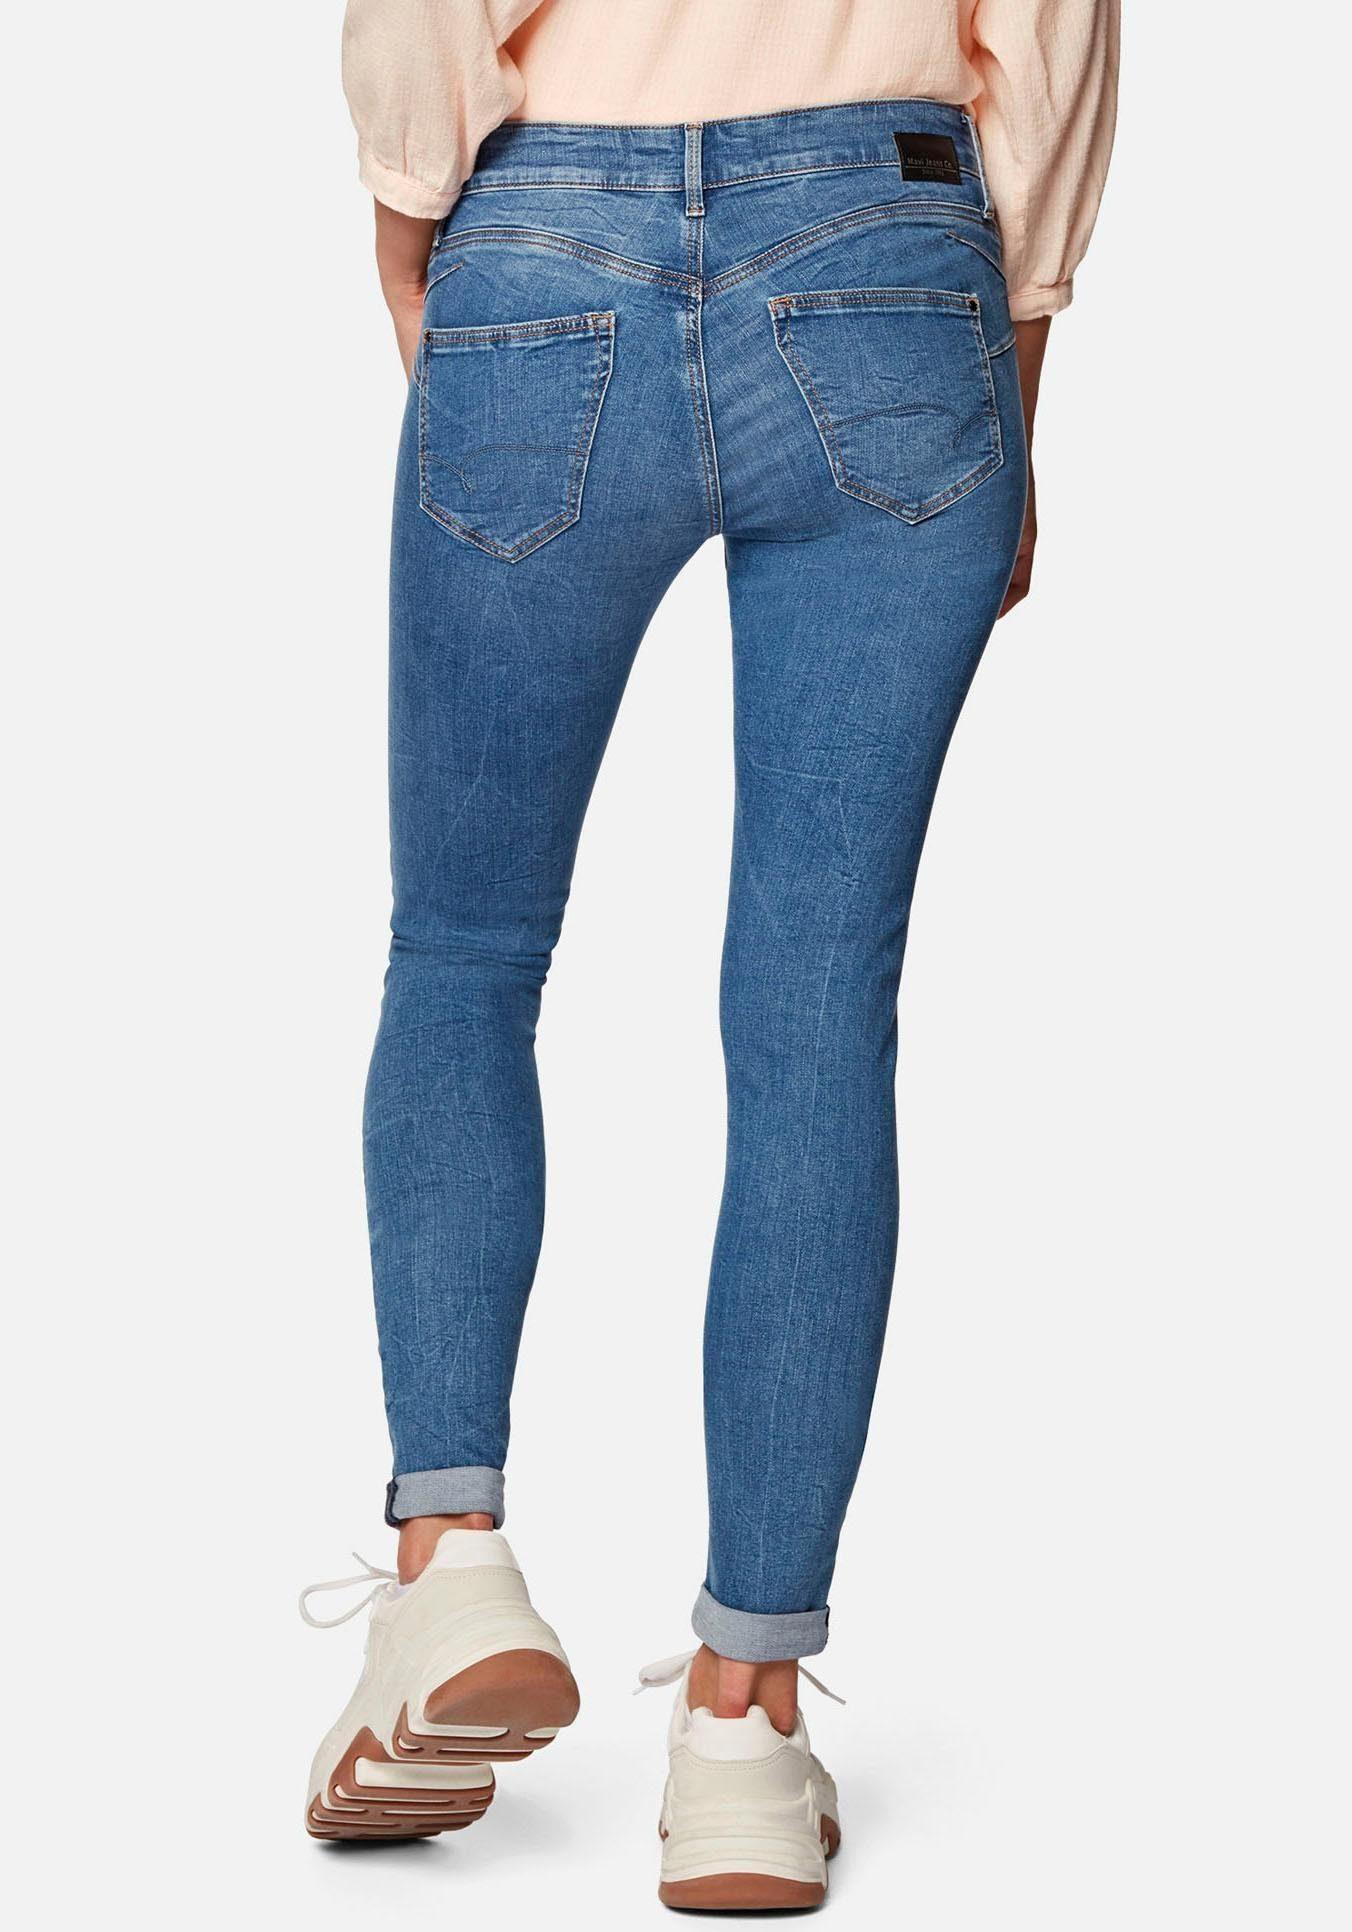 Damen High Waist Skinny Hüft Jeans Hose mit Glamour-Effekt in light blue